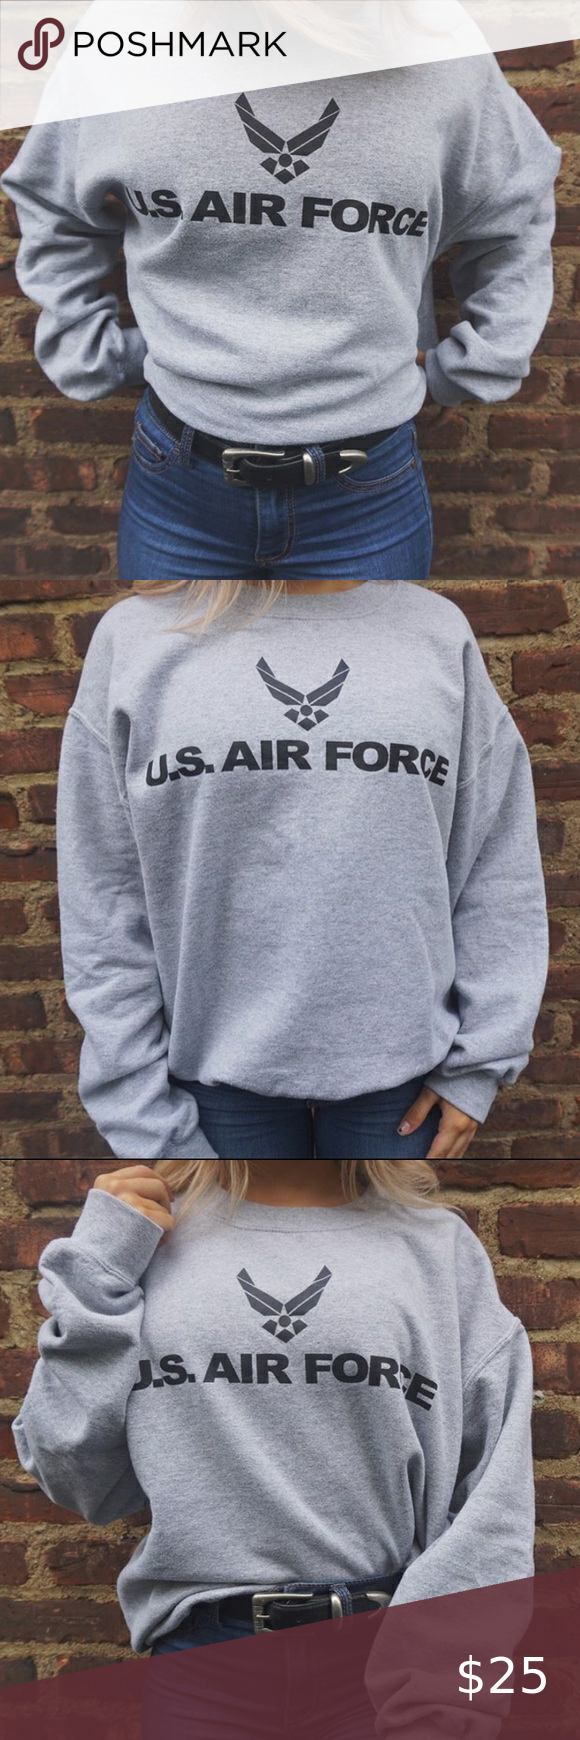 Us Air Force Crewneck Sweaters Crewneck Us Air Force Crew Neck [ 1740 x 580 Pixel ]